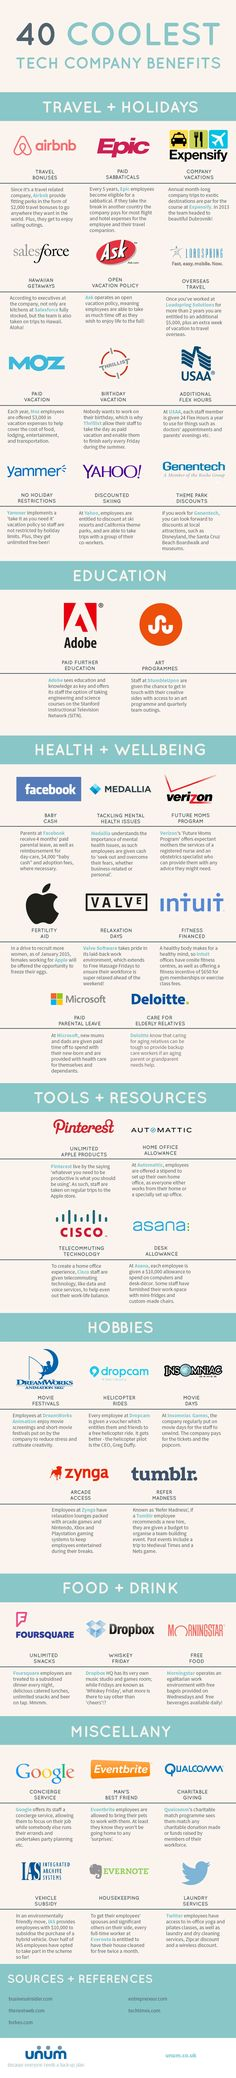 40 coolest tech company BENEFITS